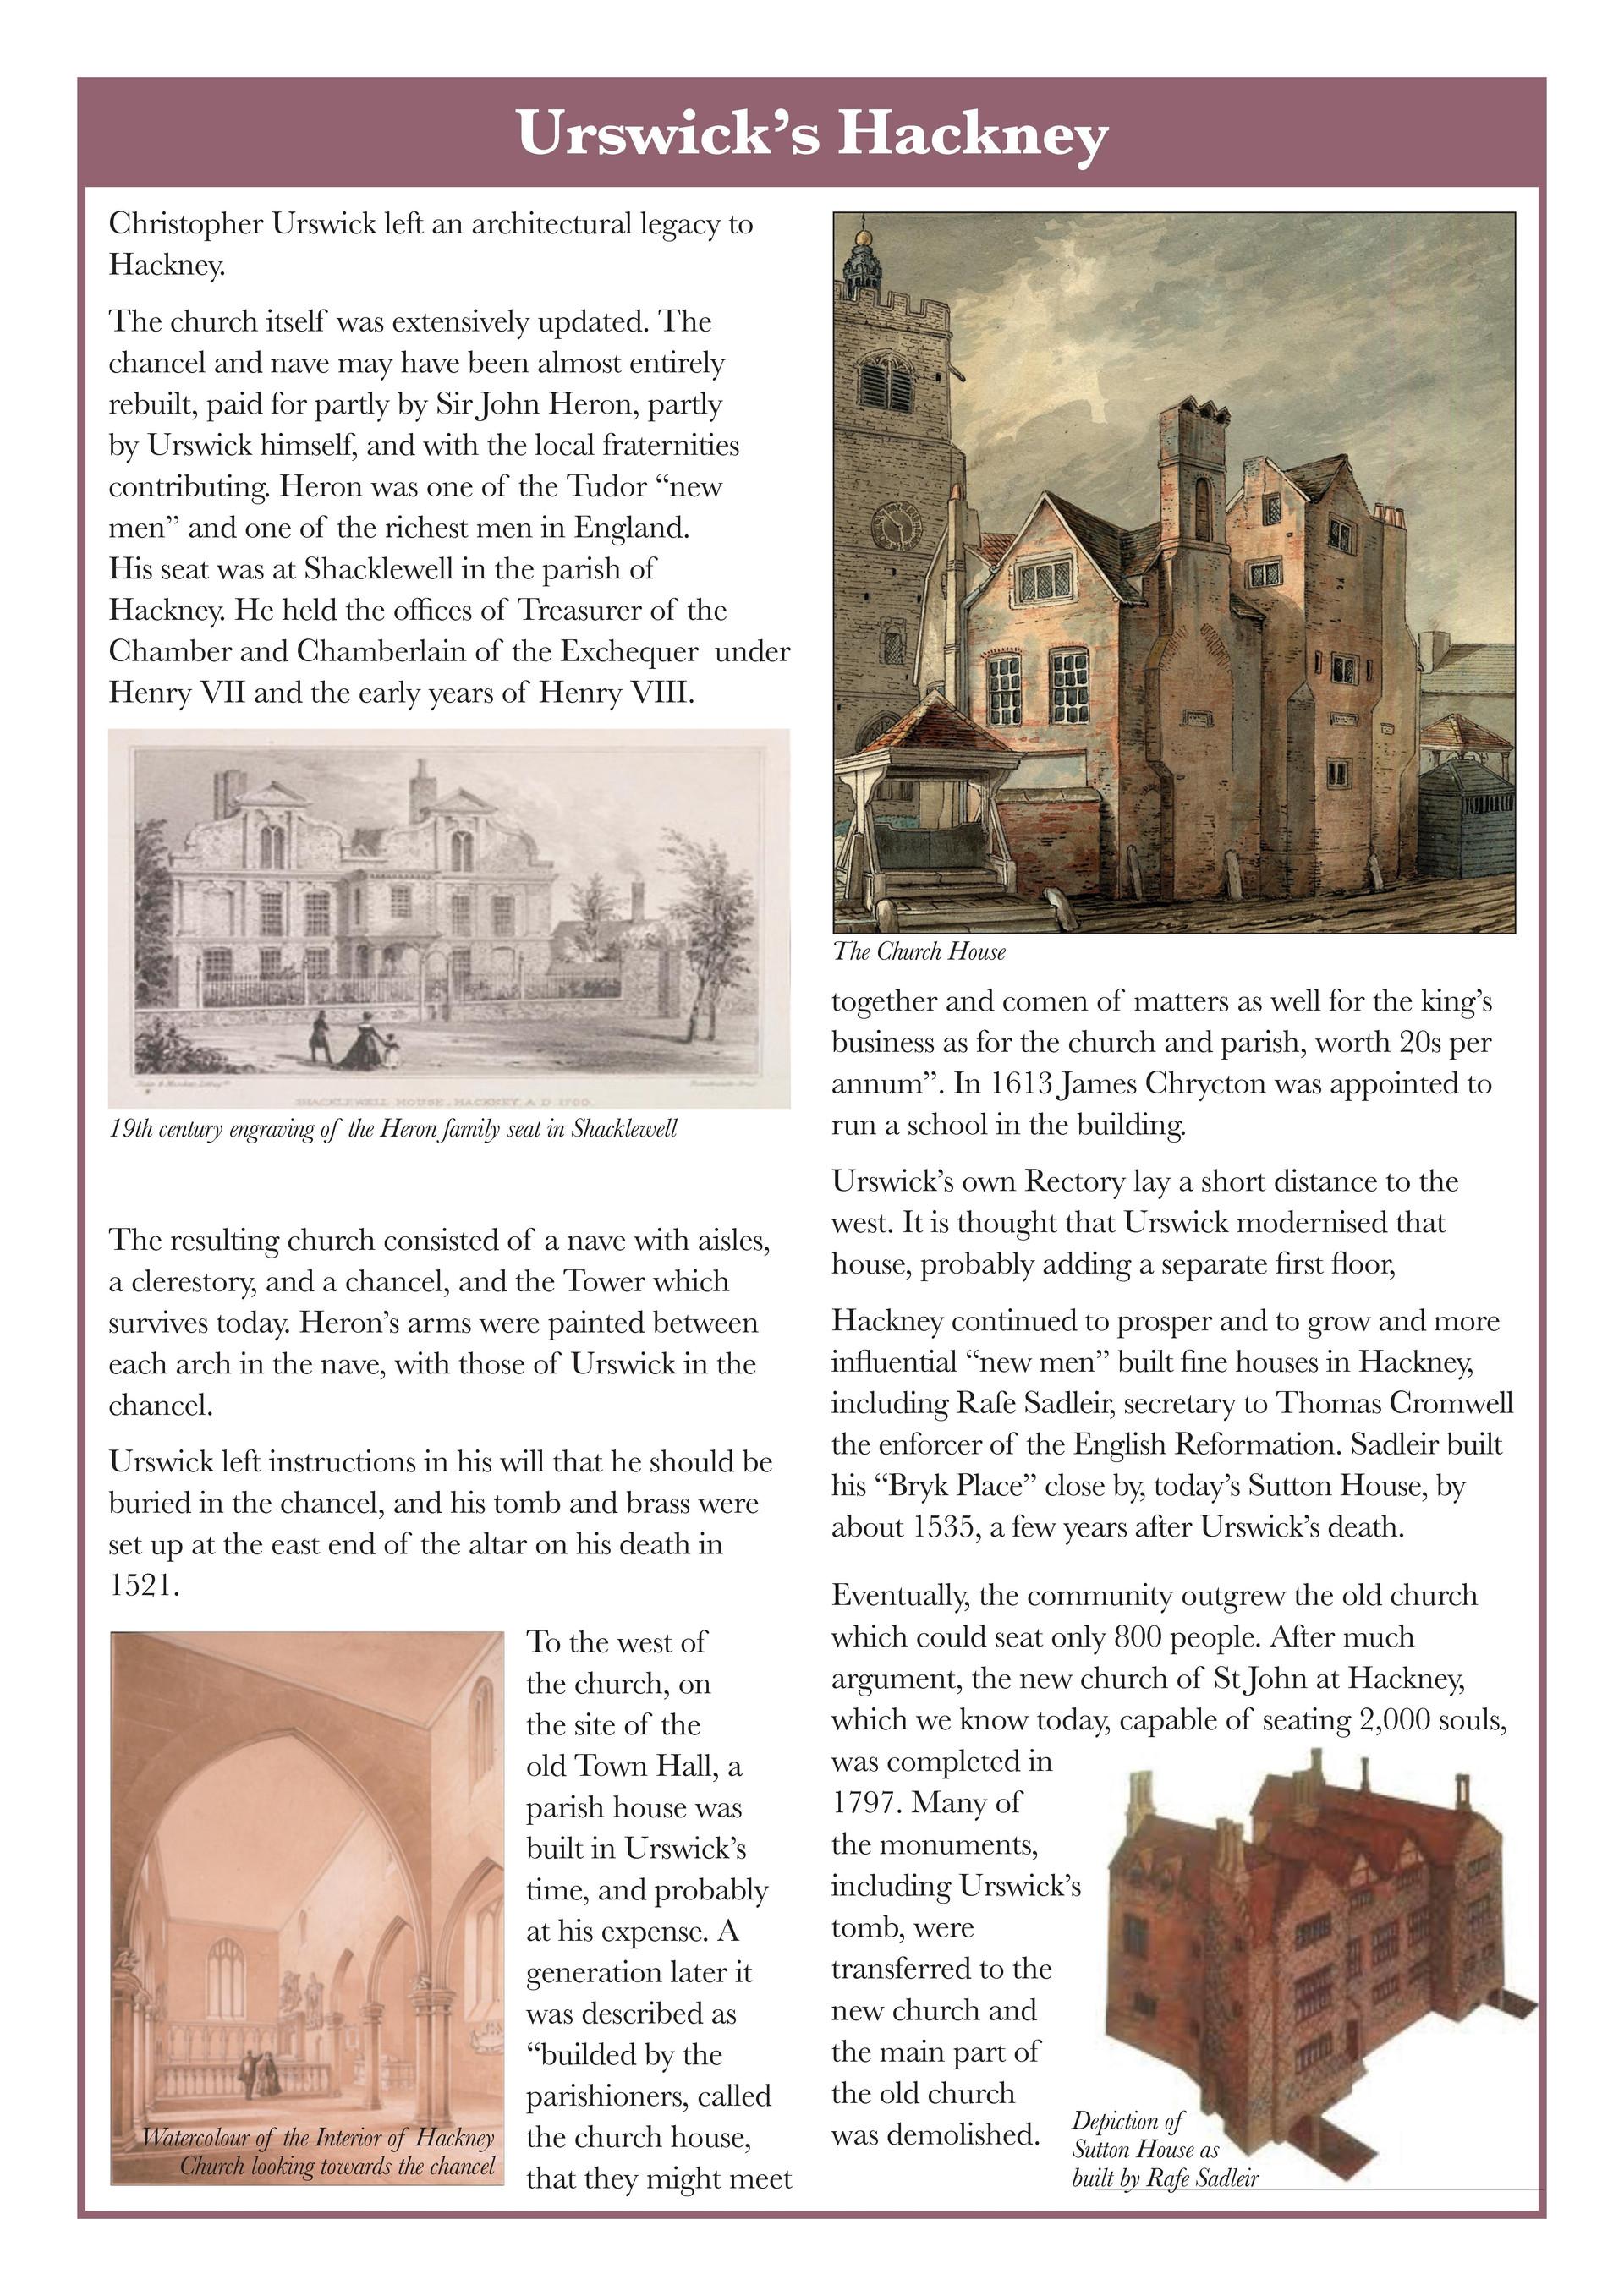 CHRISTOPHER URSWICK'S RESTORATION OF ST. AUGUSTINE'S CHURCH /6